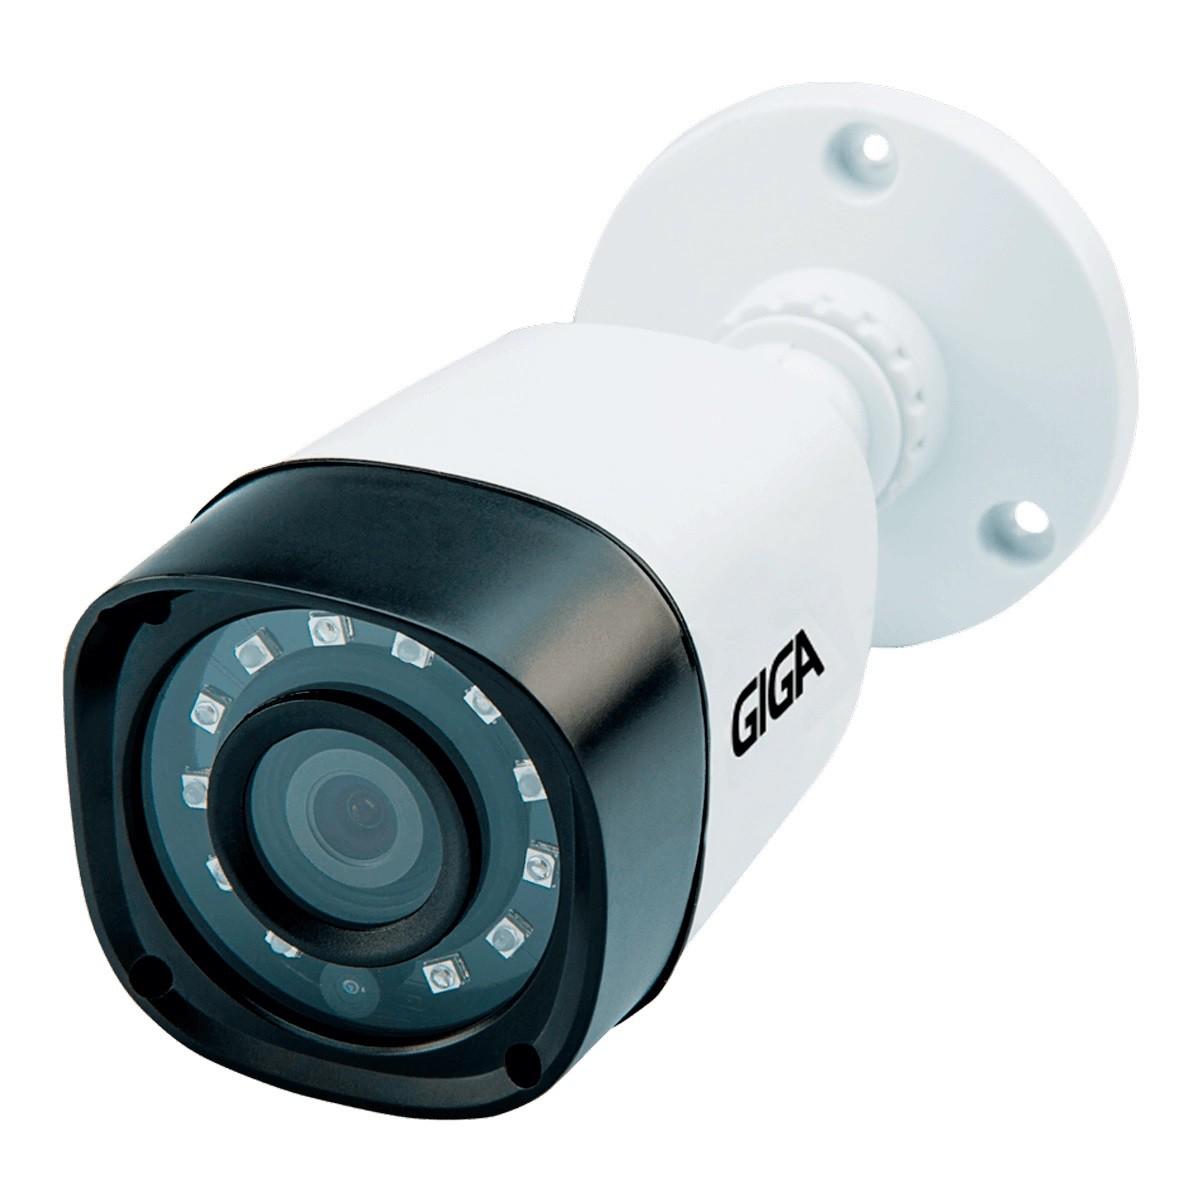 Câmera de segurança Bullet Giga Full HD 1080p Orion Infra 20M 3,6mm IP66 GS0271